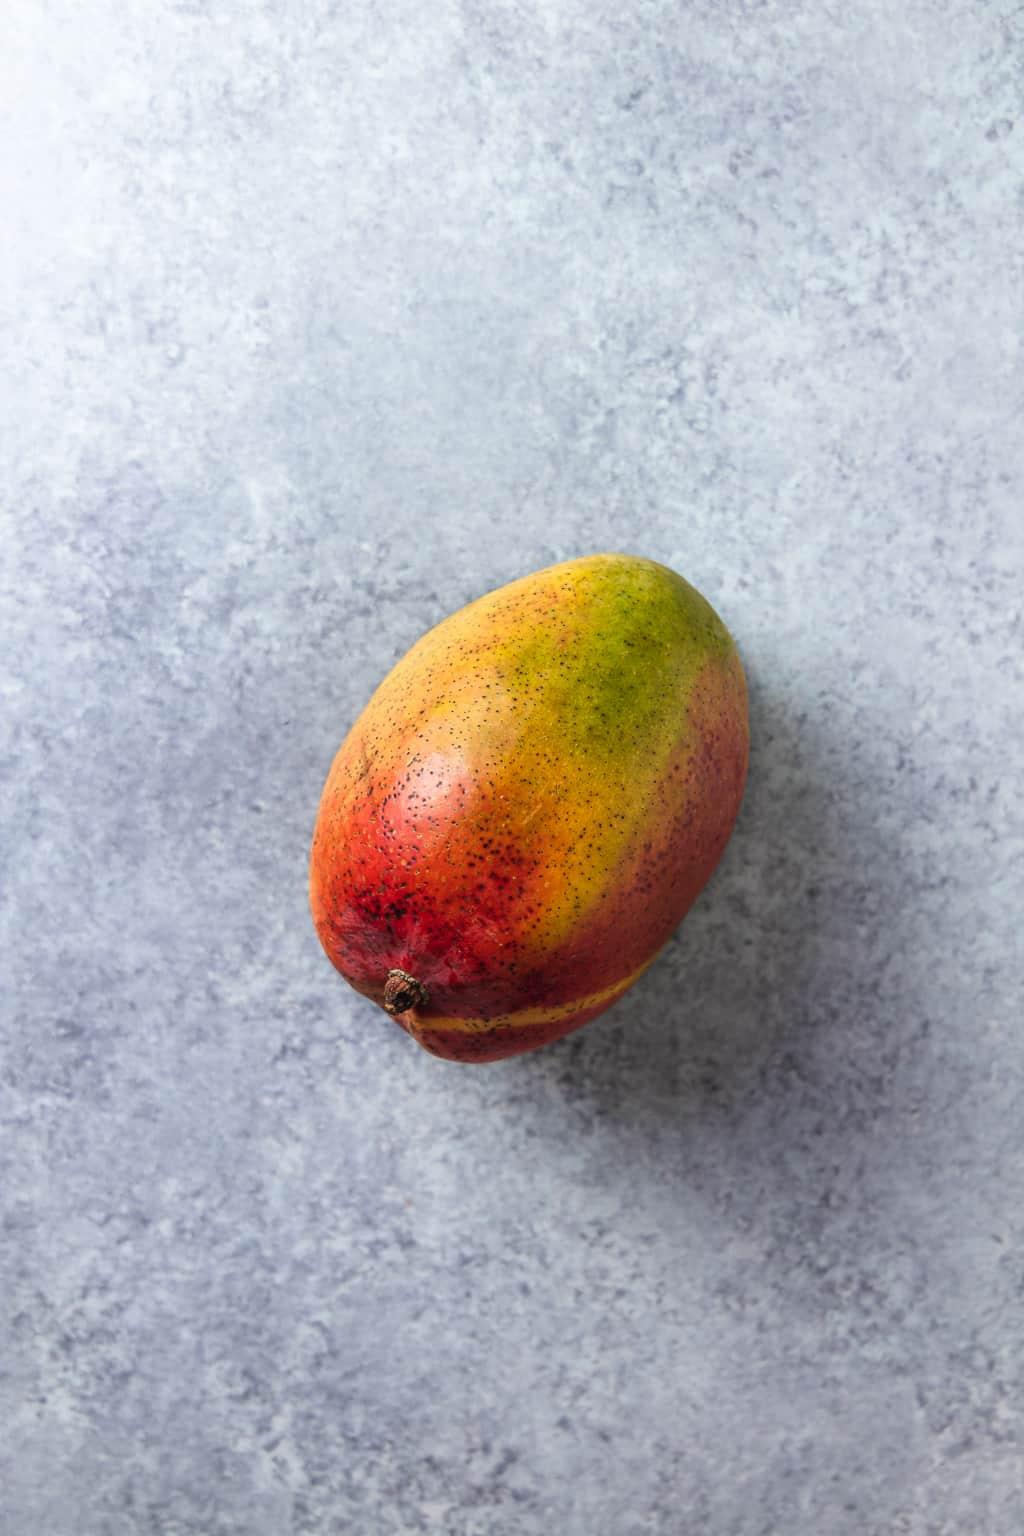 mango on a grey background